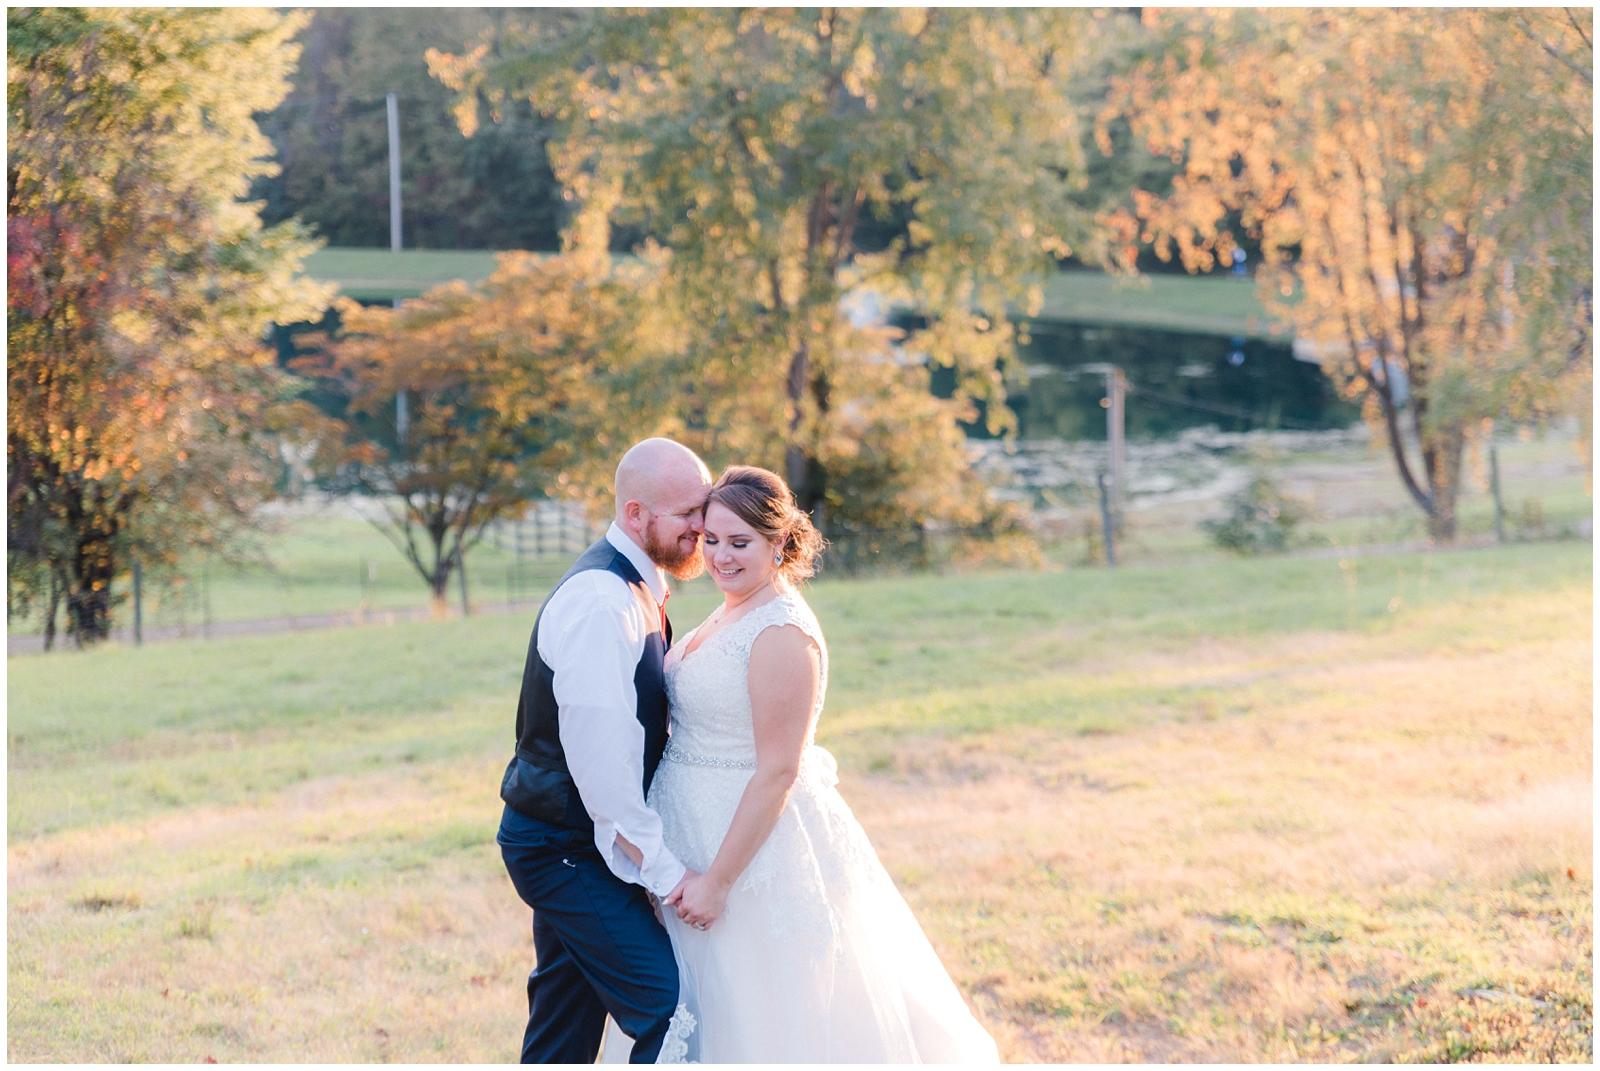 lancaster-ohio-fall-wedding-lra-photo_0026.jpg